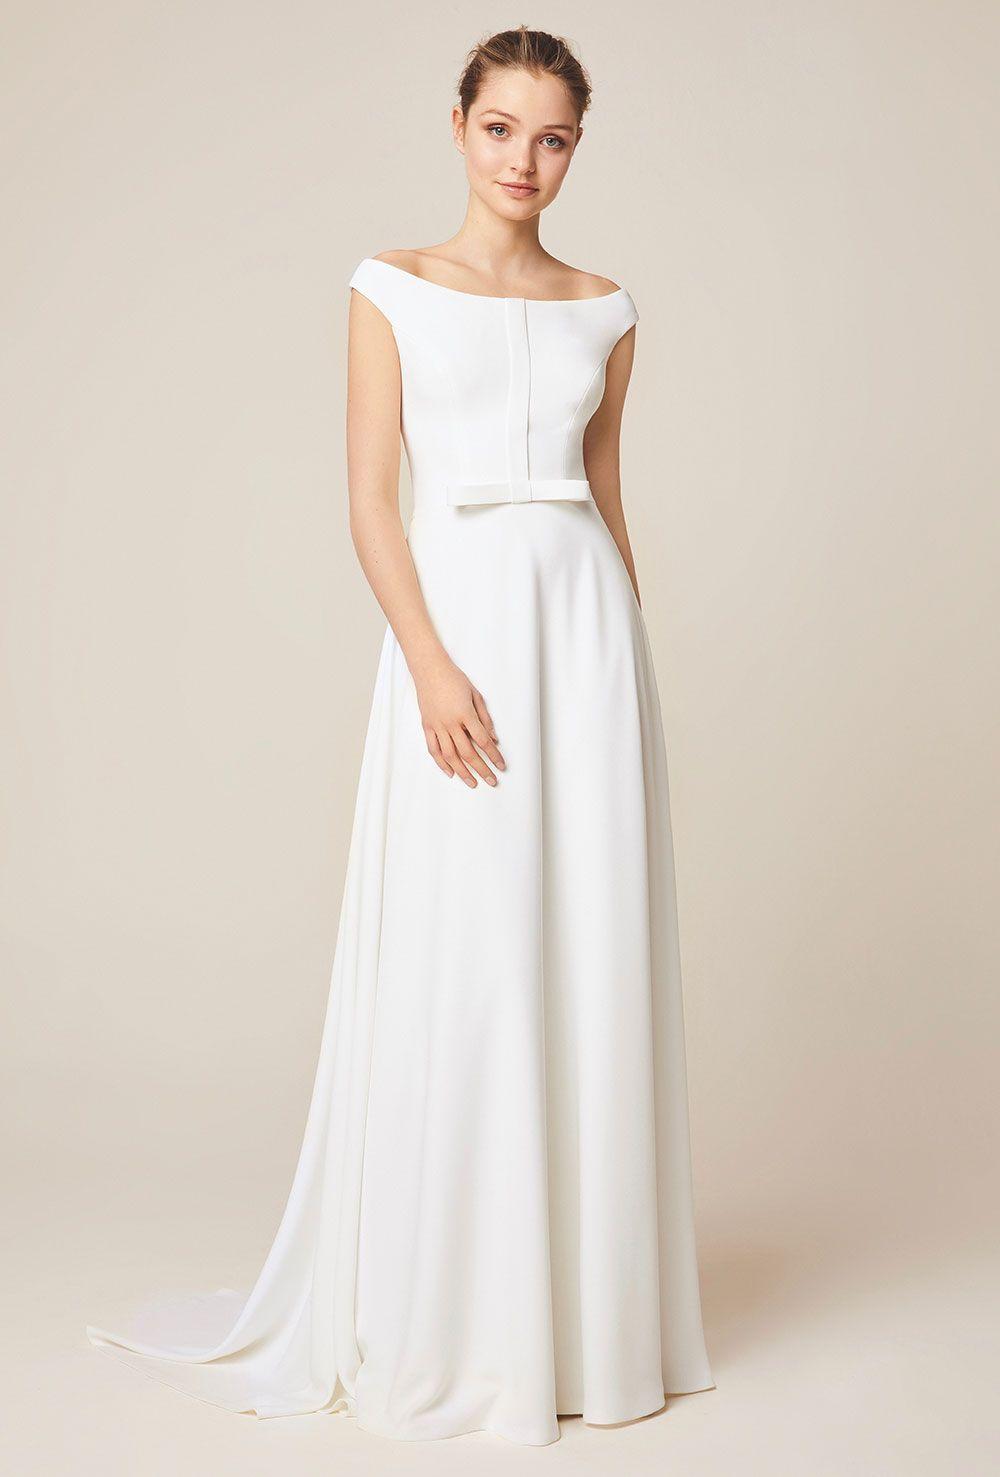 Jesus Peiro 947 Wedding Dress Miss Bush Bridal Boutique Surrey Simple Elegant Wedding Dress Wedding Dresses Unique Comfortable Wedding Dress